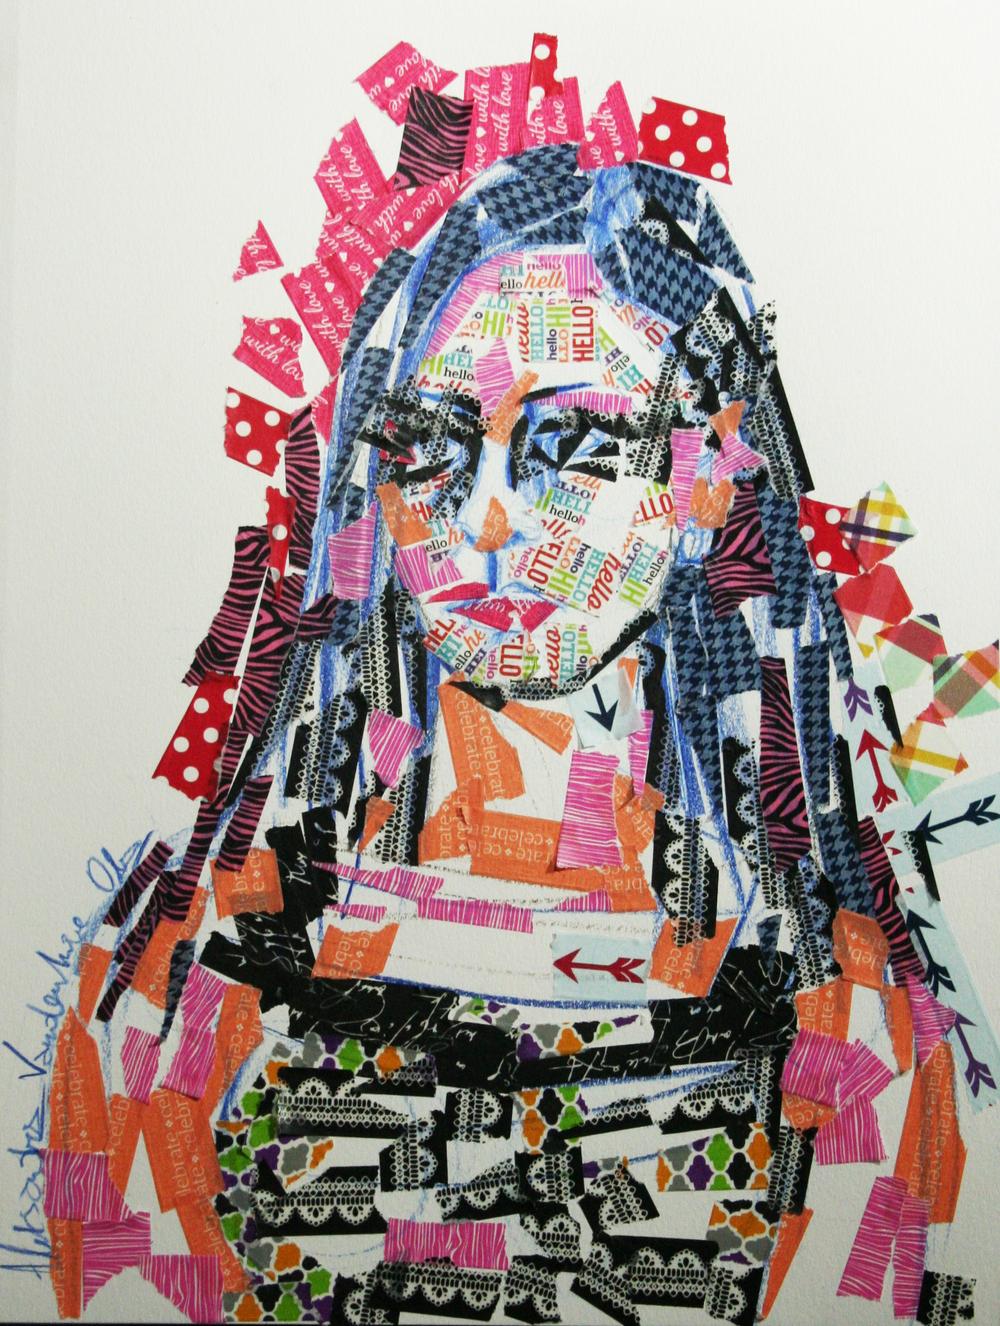 Aleksandra Vandenhove did this hour and a half sticker portrait.